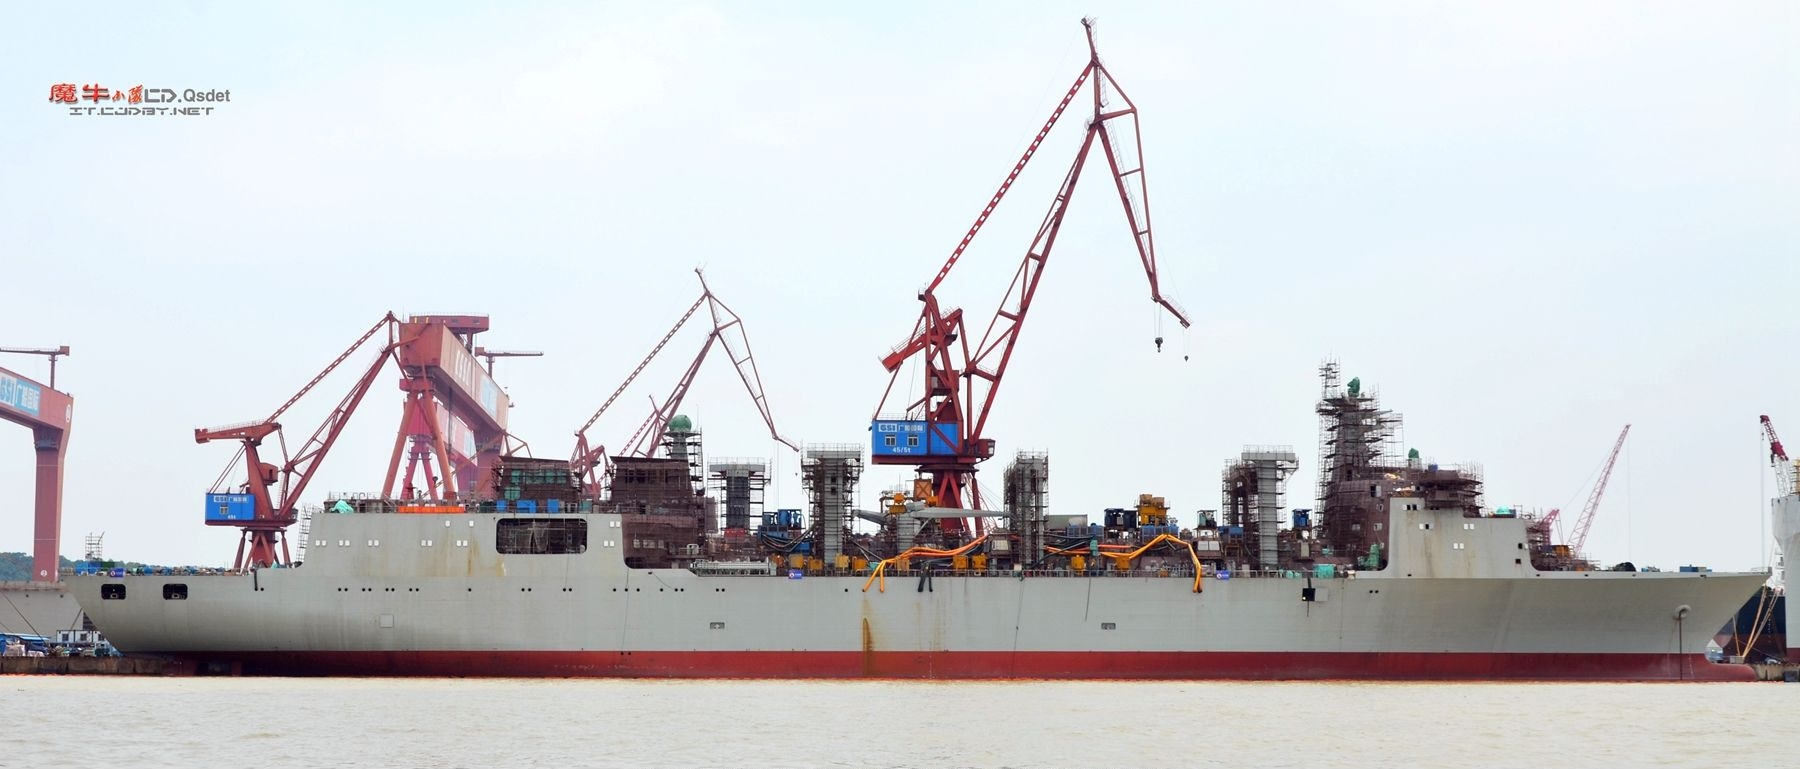 Premier Type 901 au chantier naval GSO